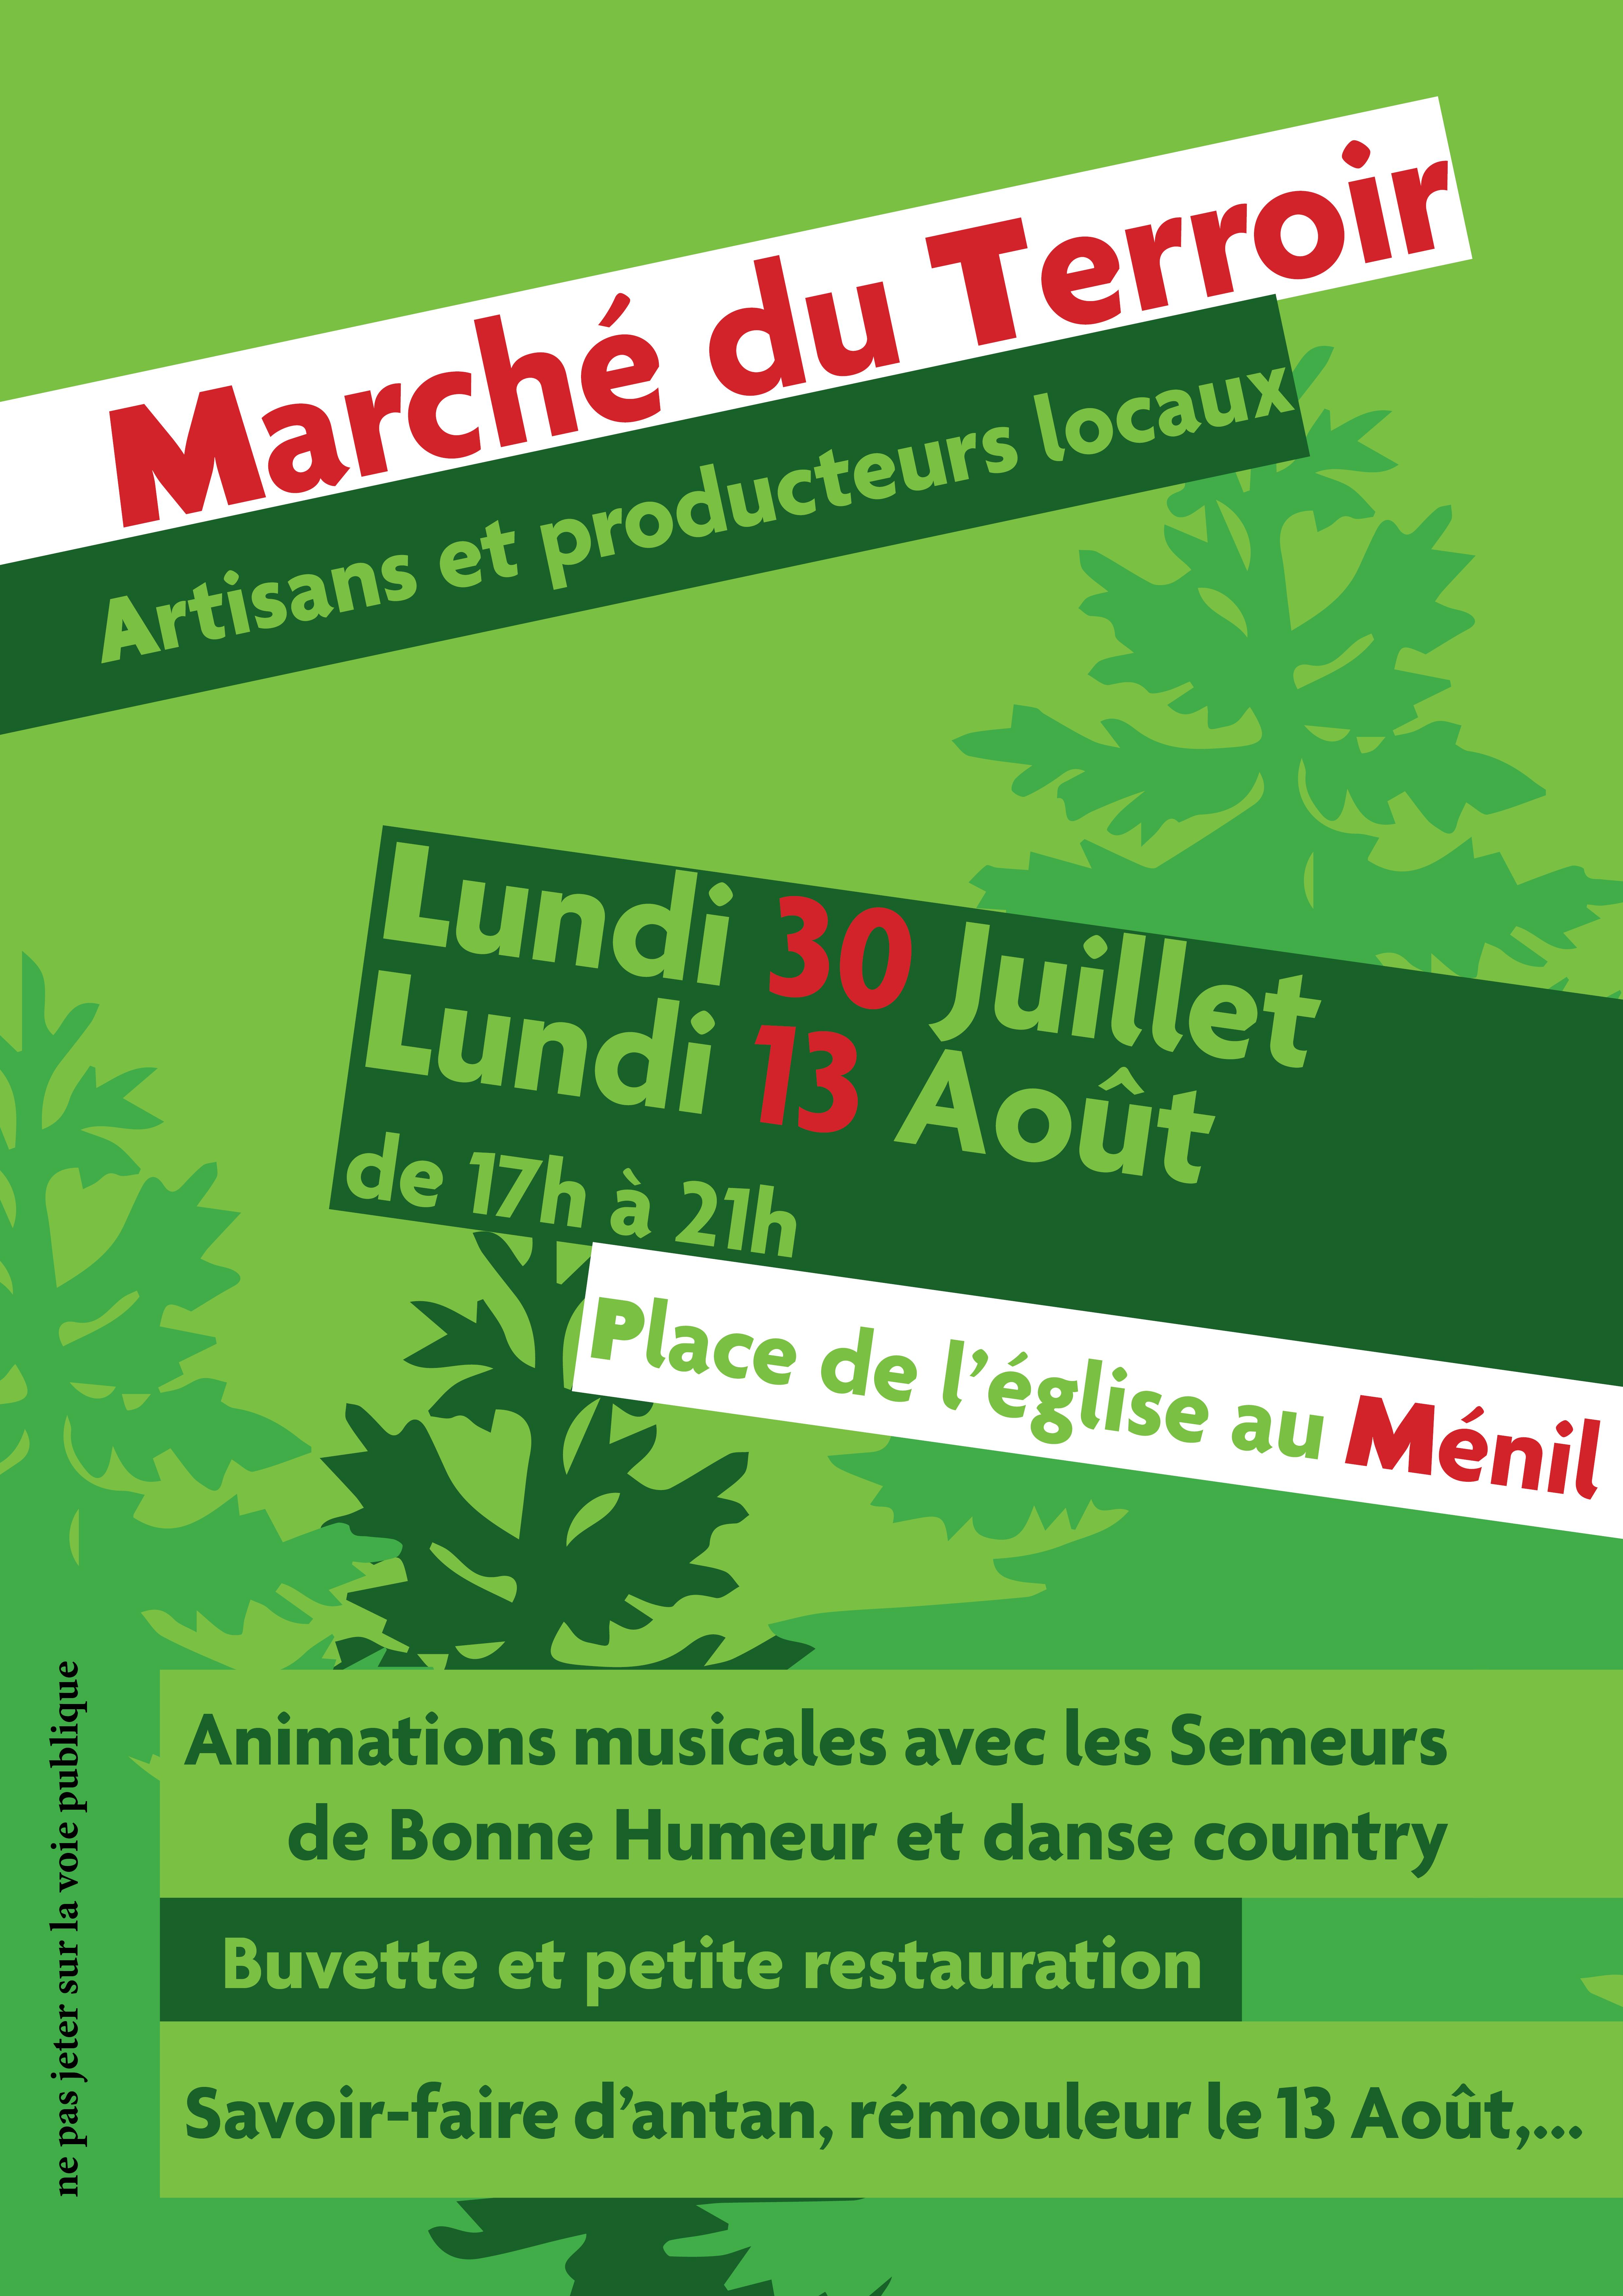 Marche_Guedon_2018